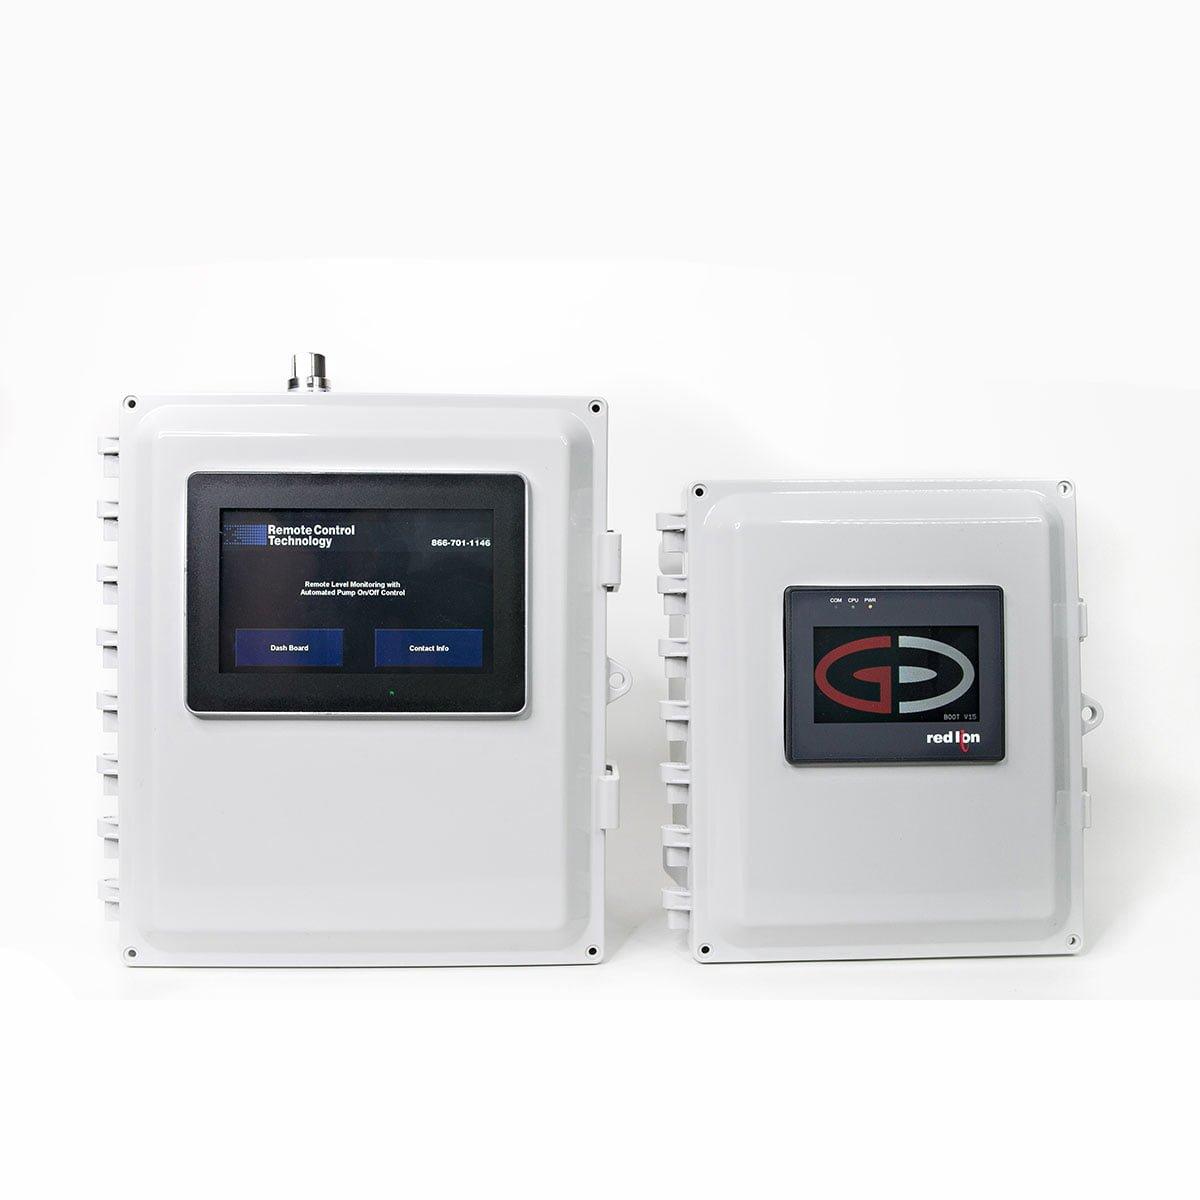 Remote Control Tech - Enclosures-with-Kadet-and-Graphite-HMIs